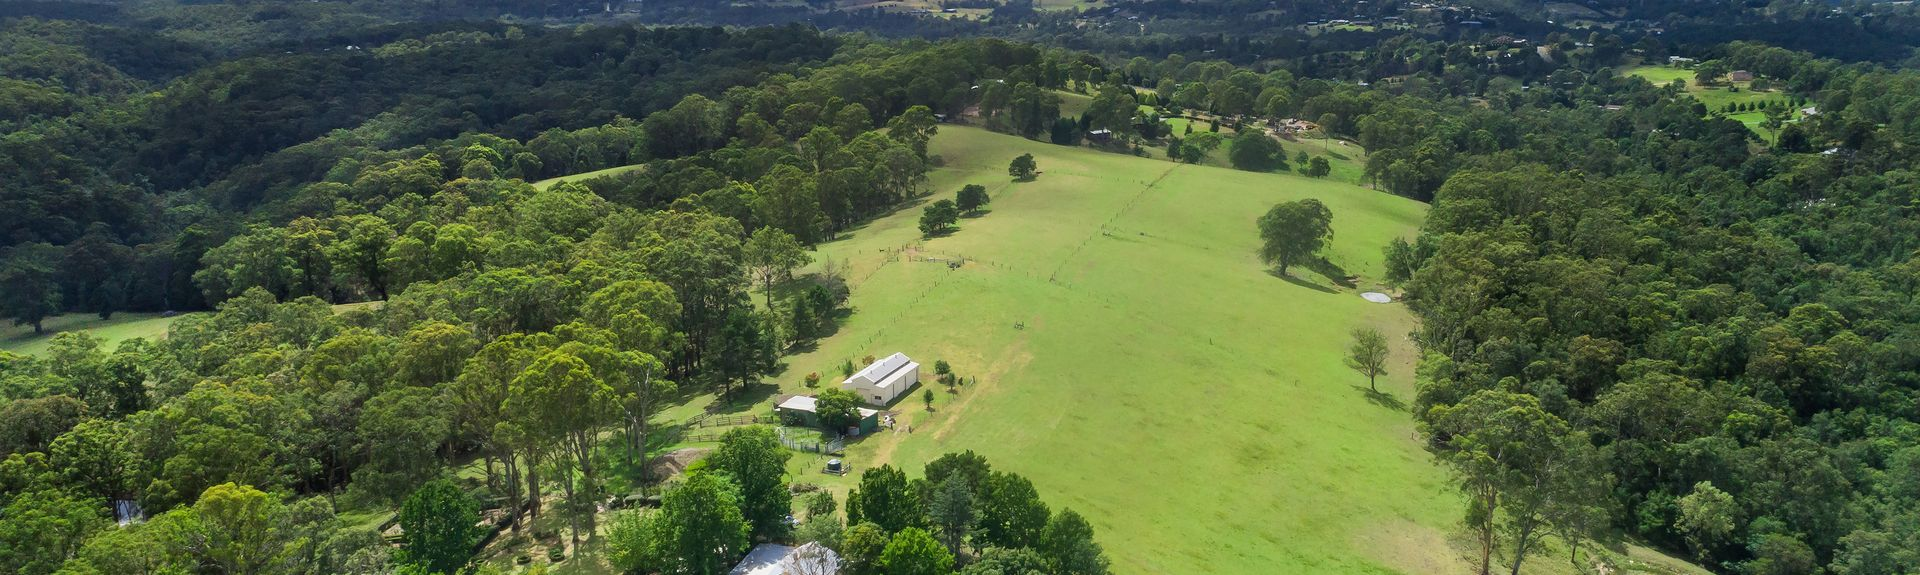 Springwood, New South Wales, Australië